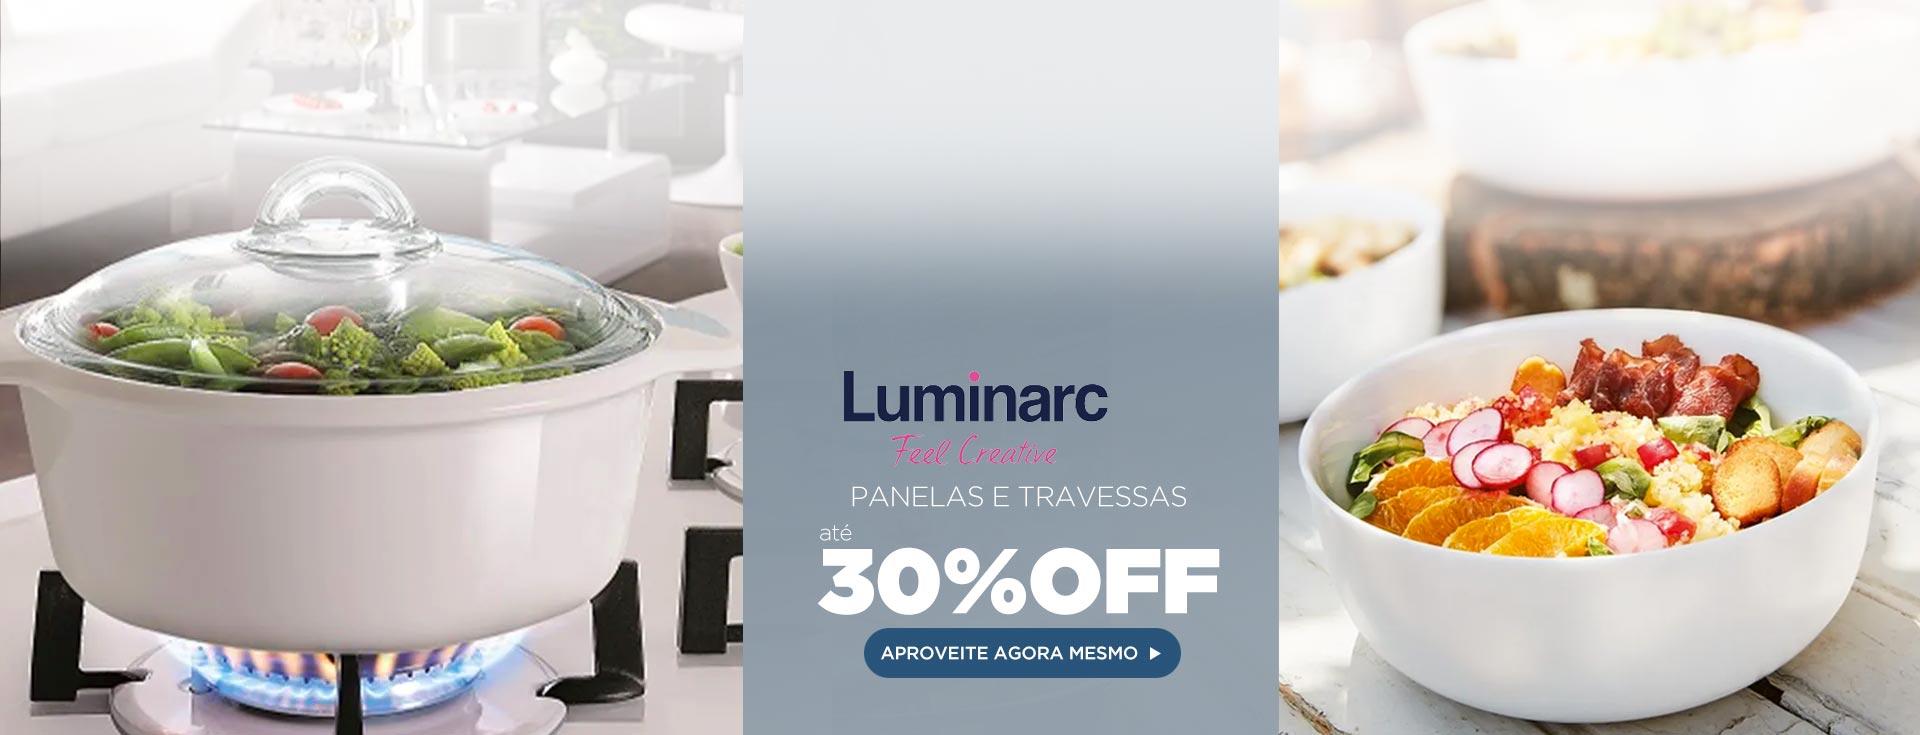 Luminarc - Desktop